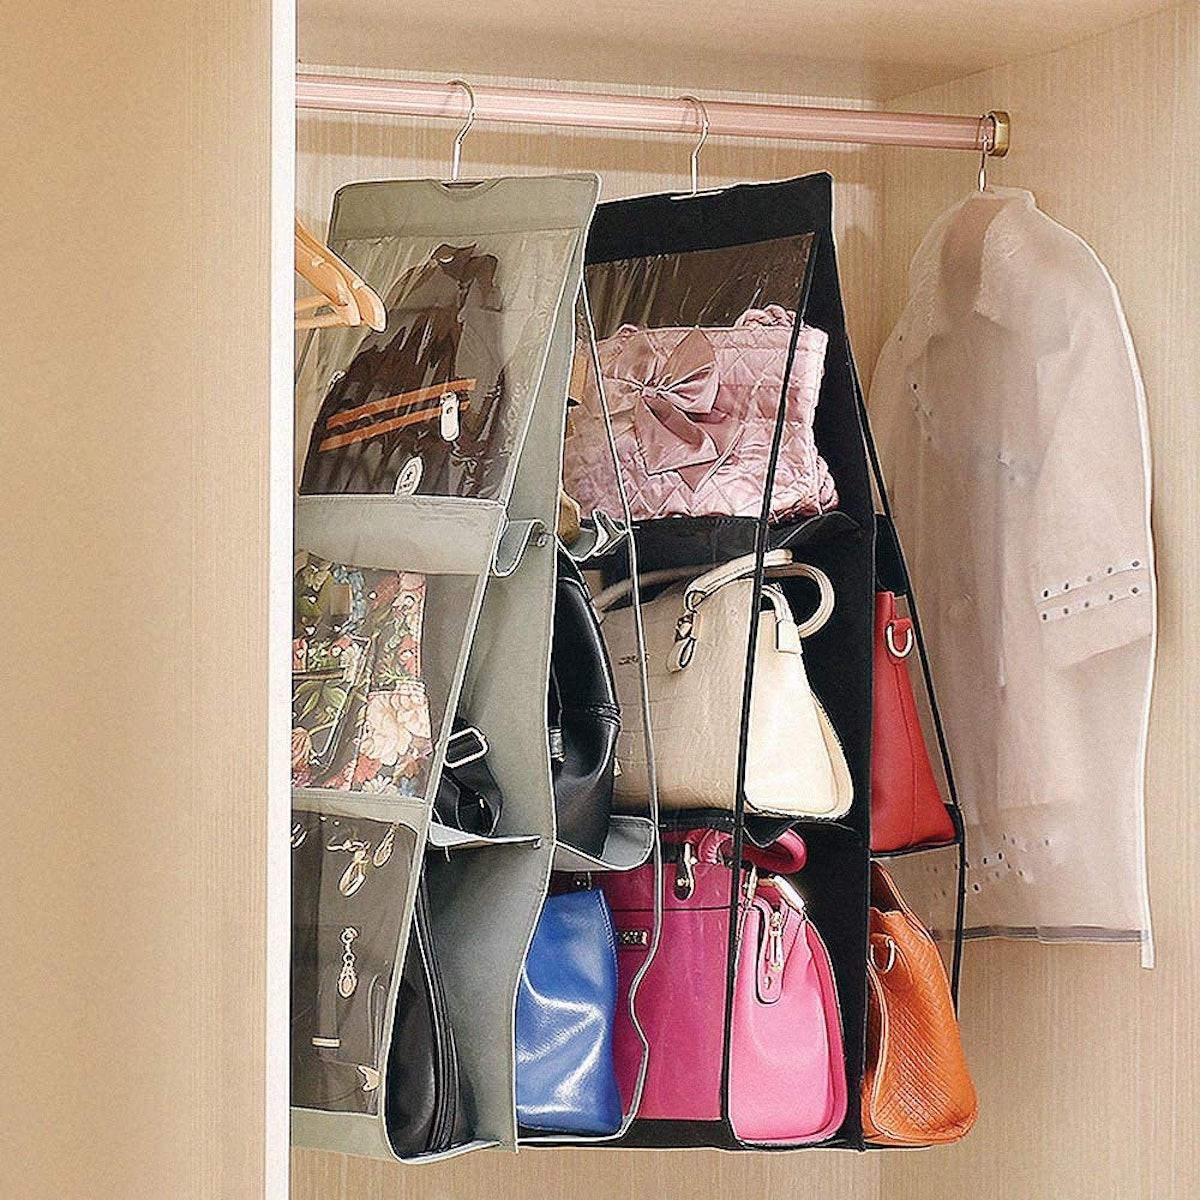 Diommell Handbag Organizer